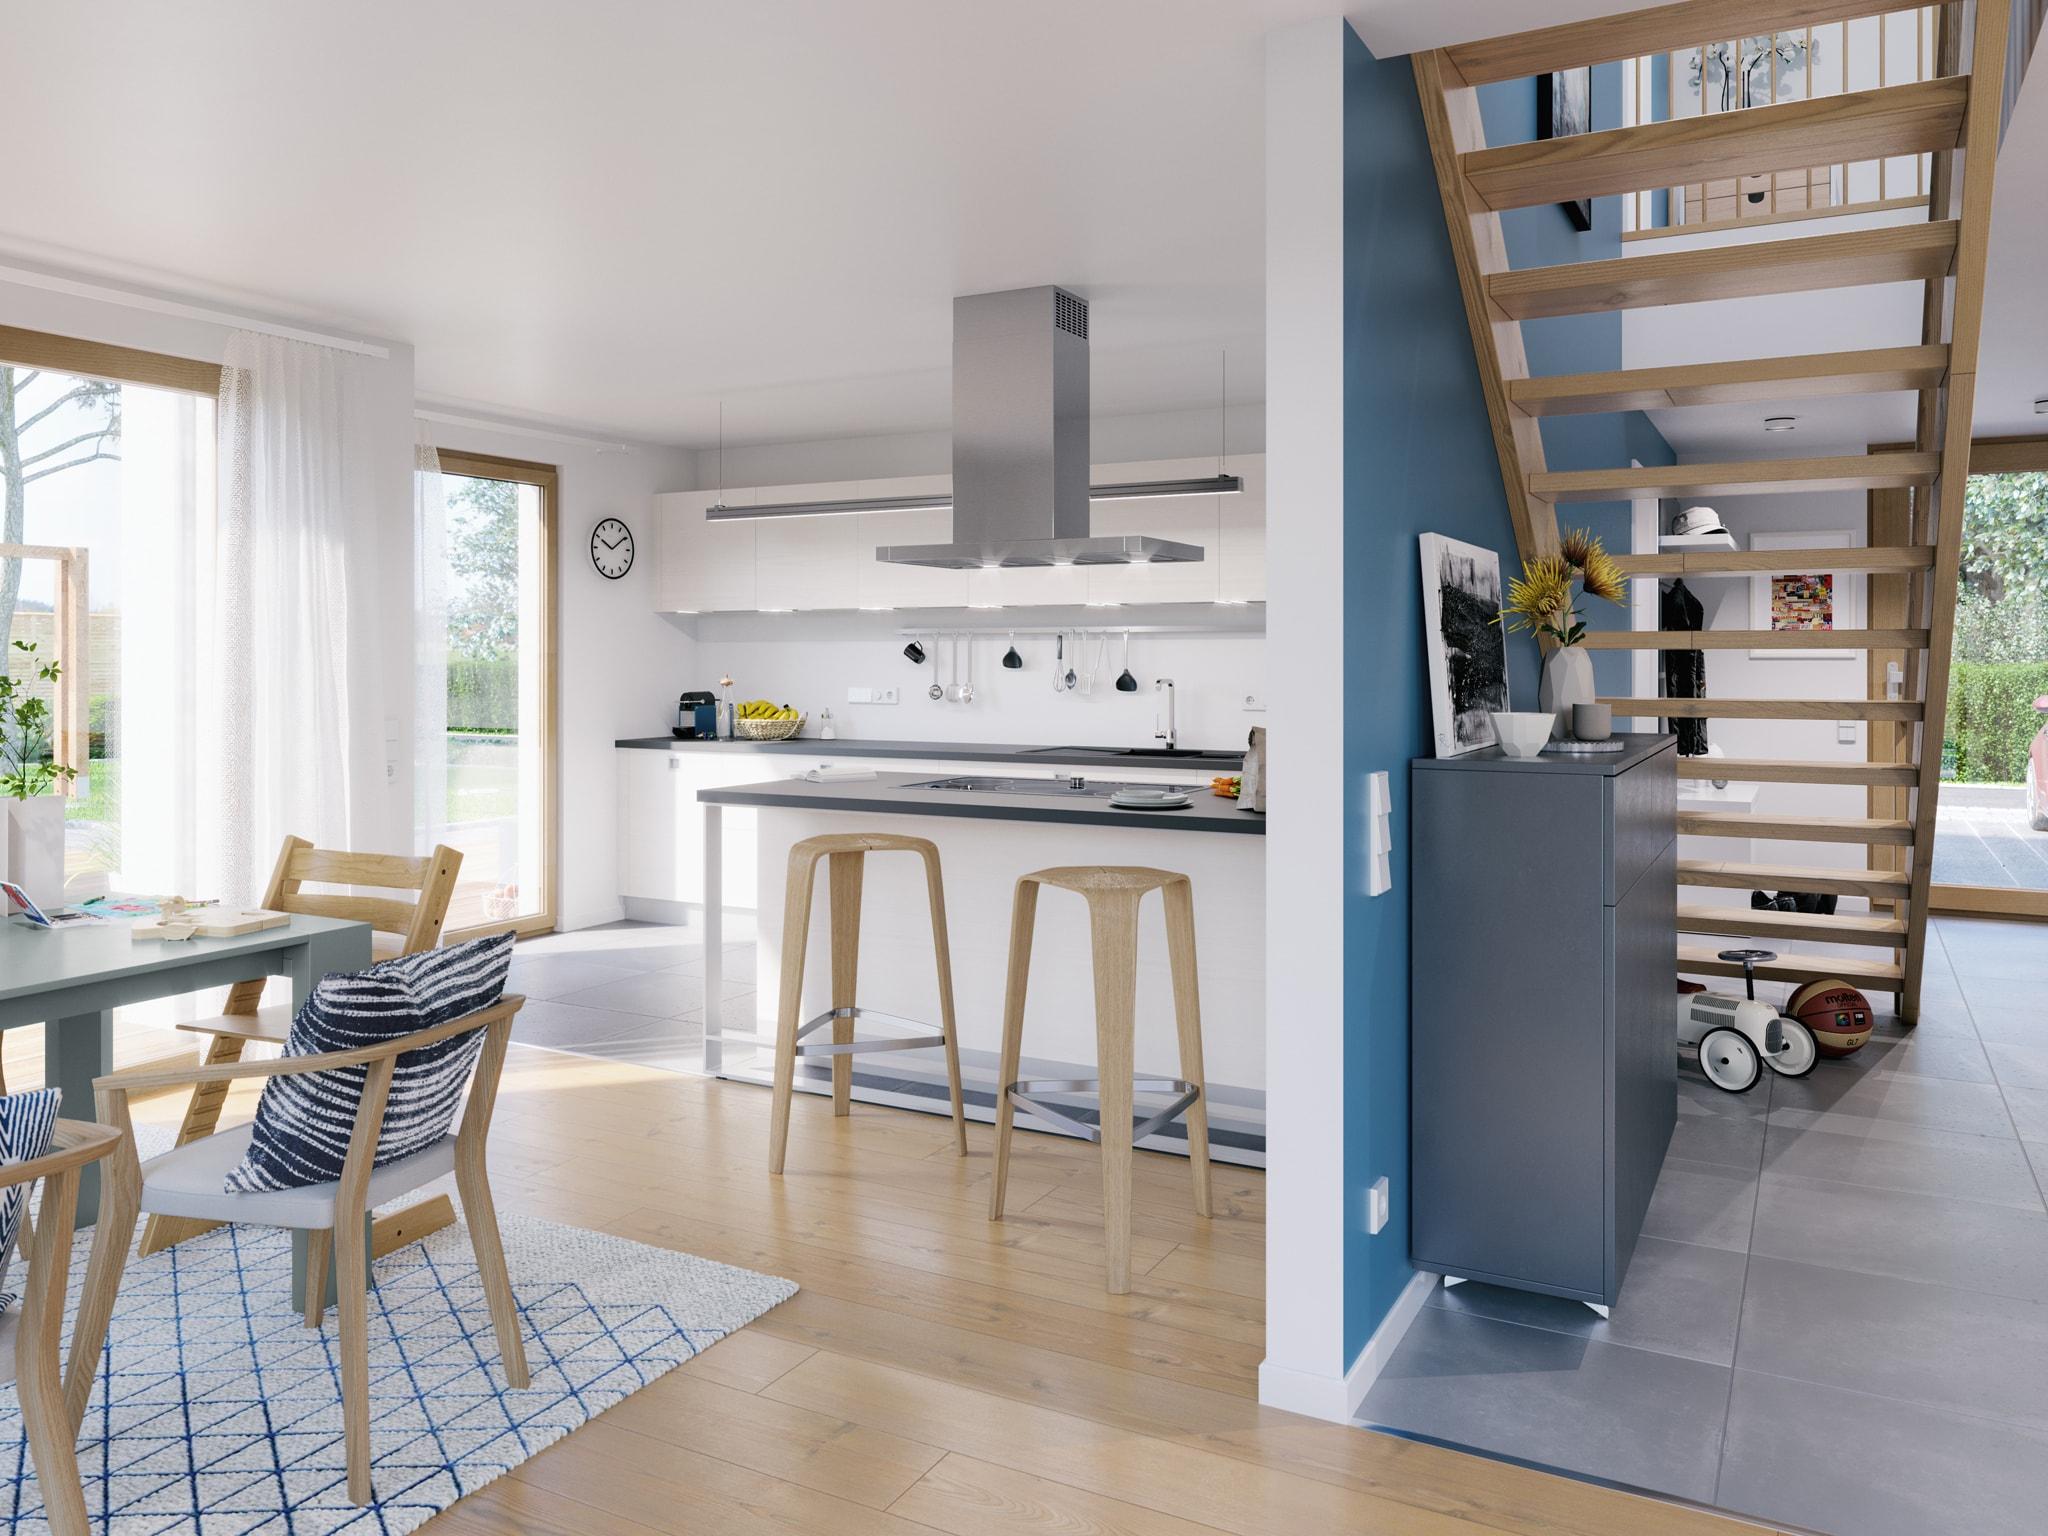 Offene Wohnlandschaft mit gerader Holz Treppe im Flur - Ideen Inneneinrichtung Fertighaus Living Haus SUNSHINE 154 V3 - HausbauDirekt.de